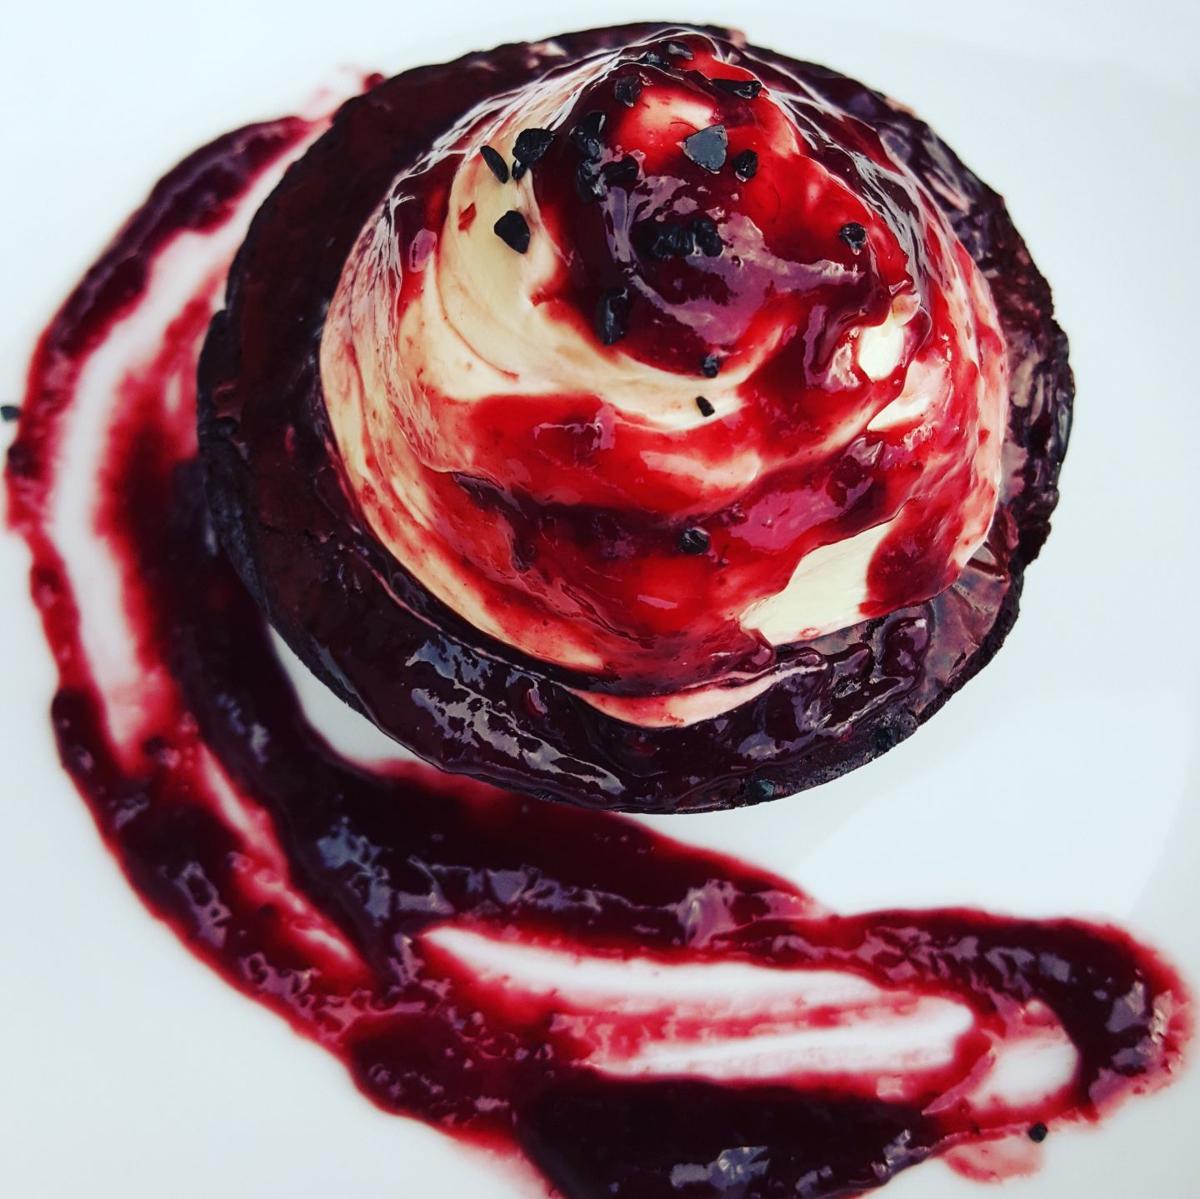 Nuvo Red Velvet Cake Drink Recipes